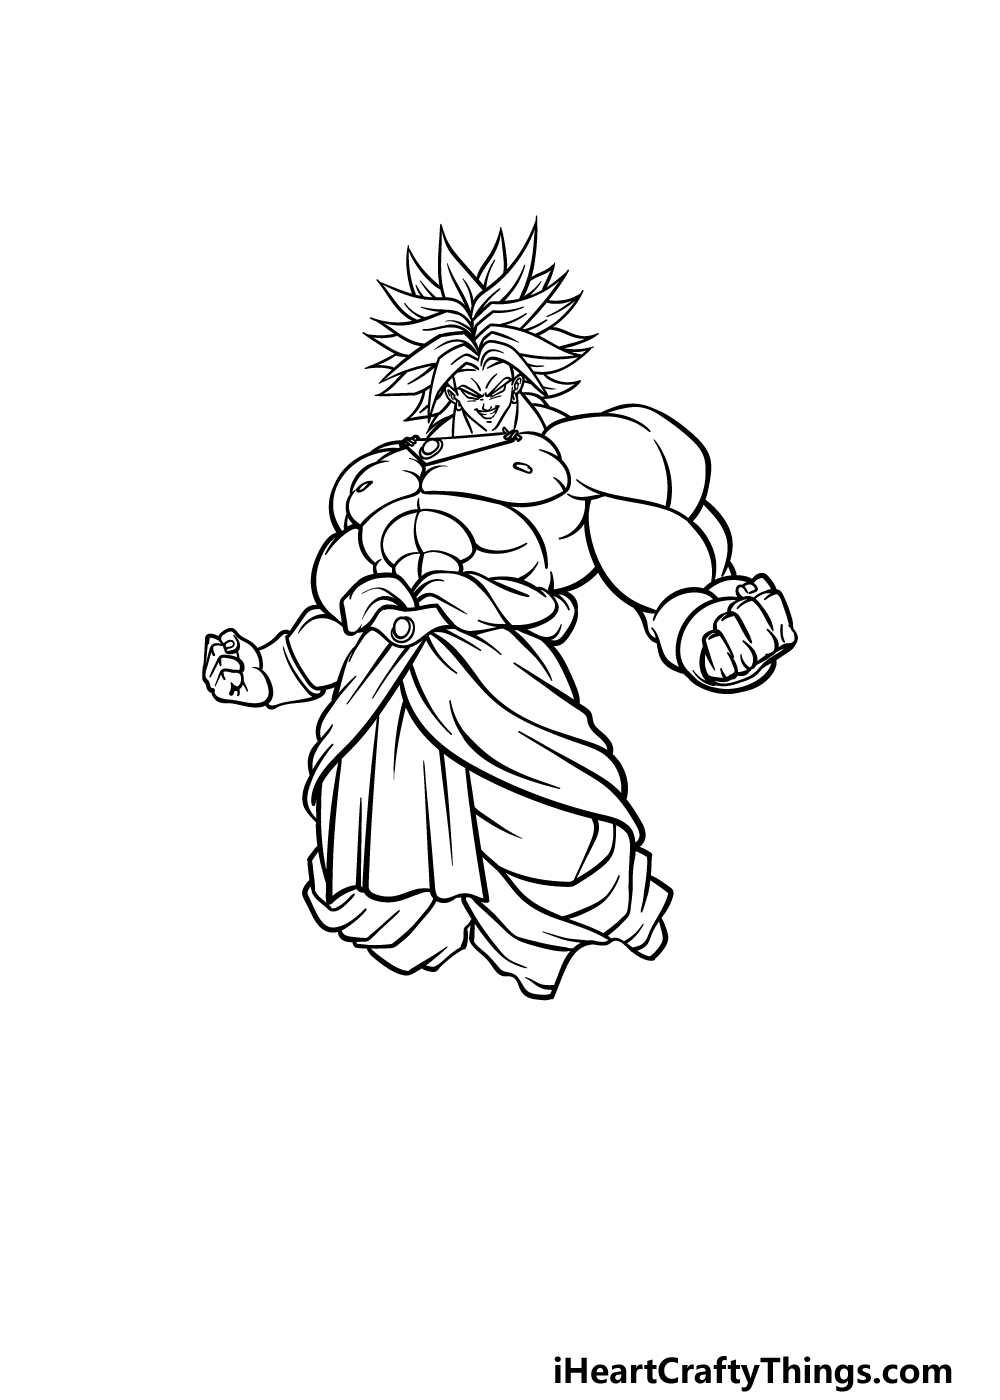 drawing Broly step 4